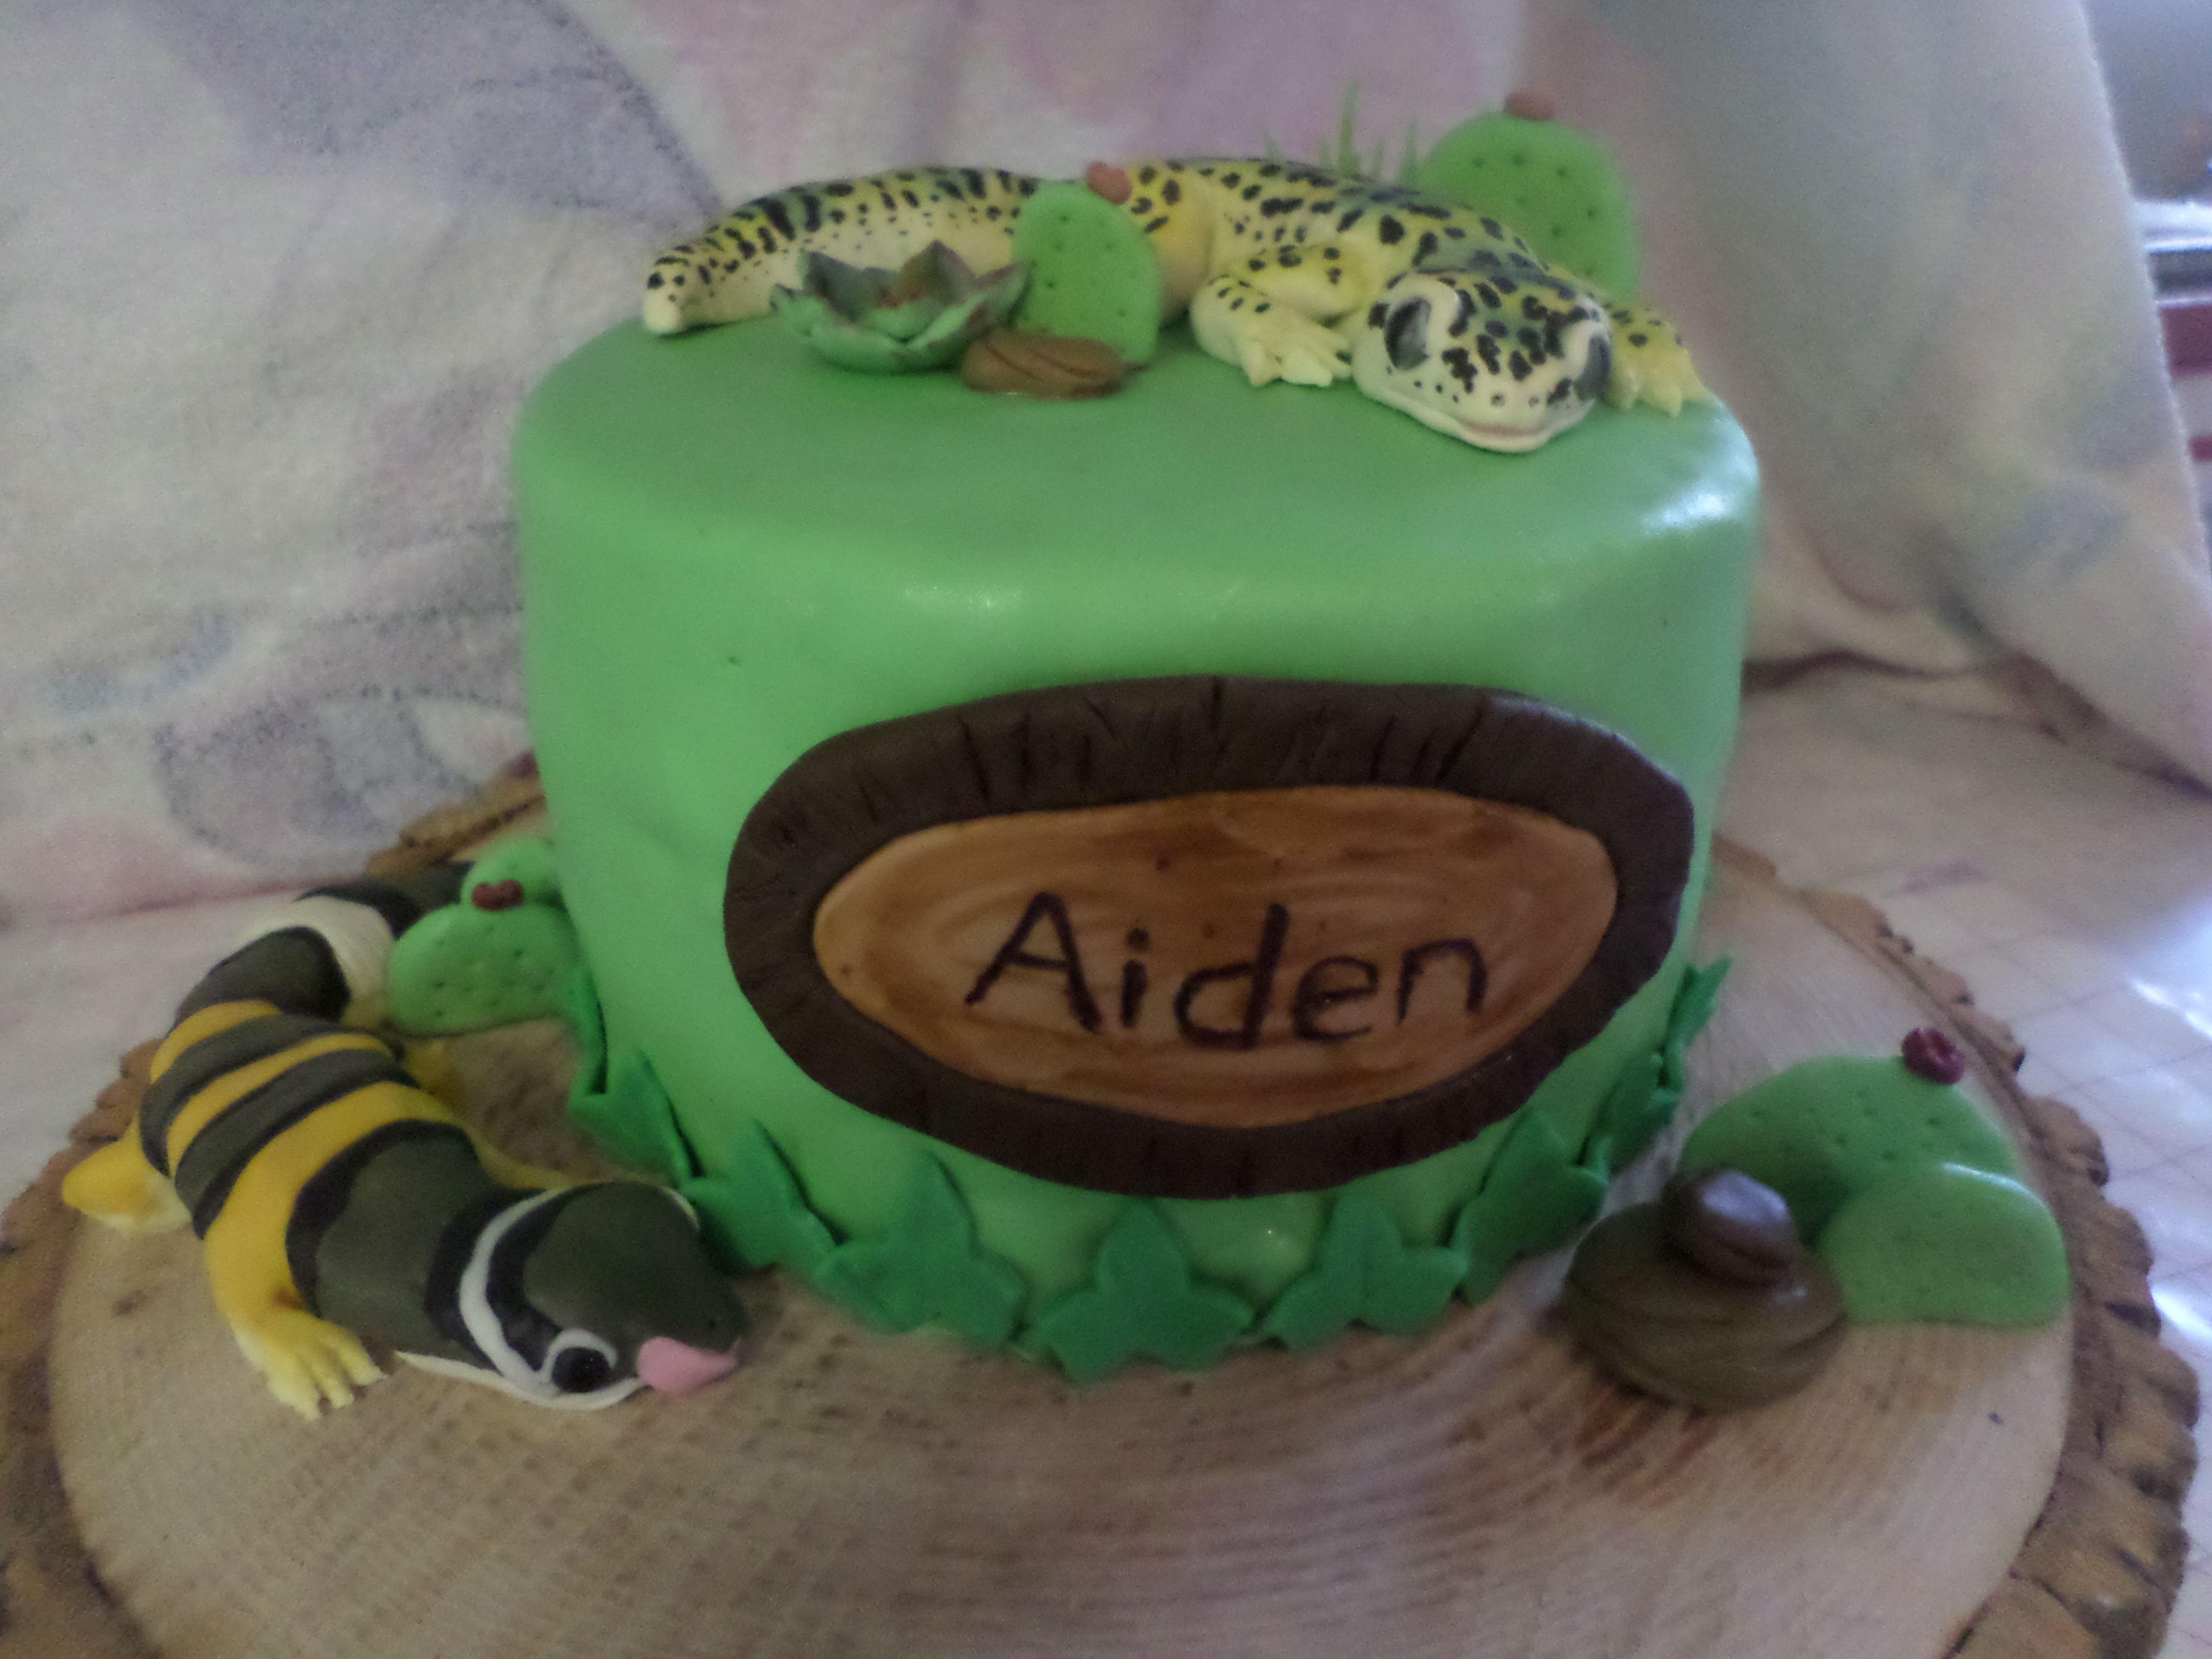 Gecko lézard Cookie Pâtisserie Biscuit Cutter Icing Fondant Pâtisserie BAKE Cuisine Mignon